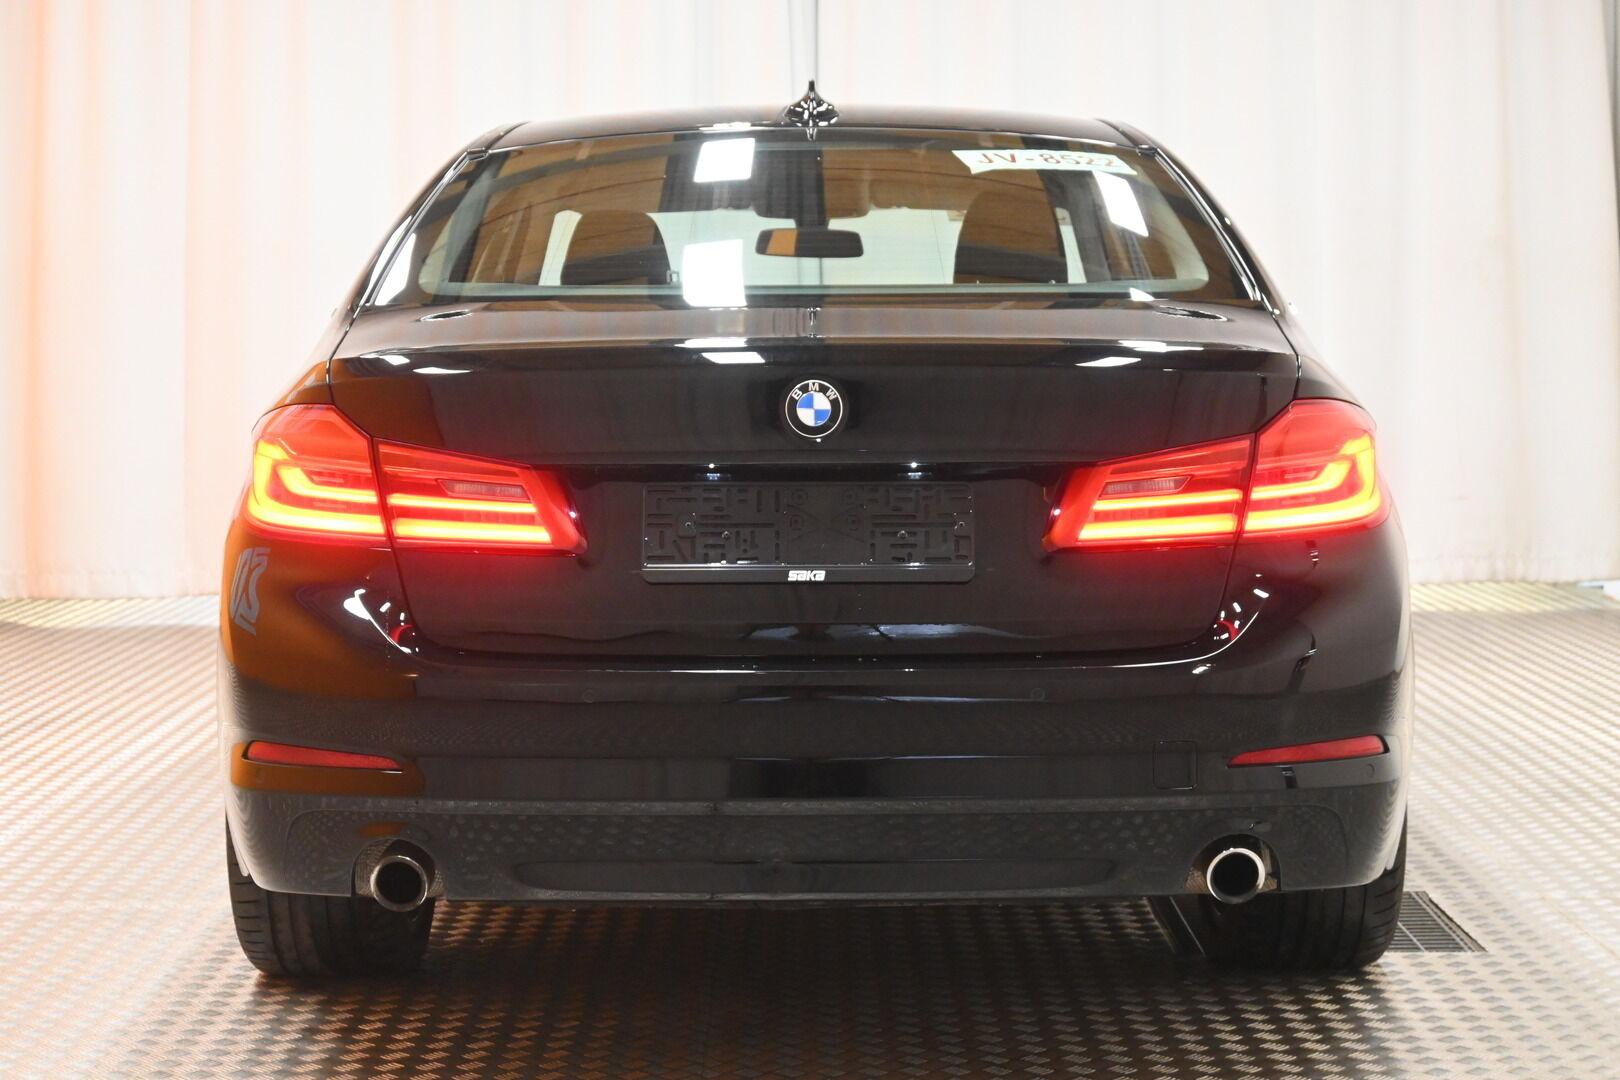 Musta Sedan, BMW 530 – KON-32251, kuva 5